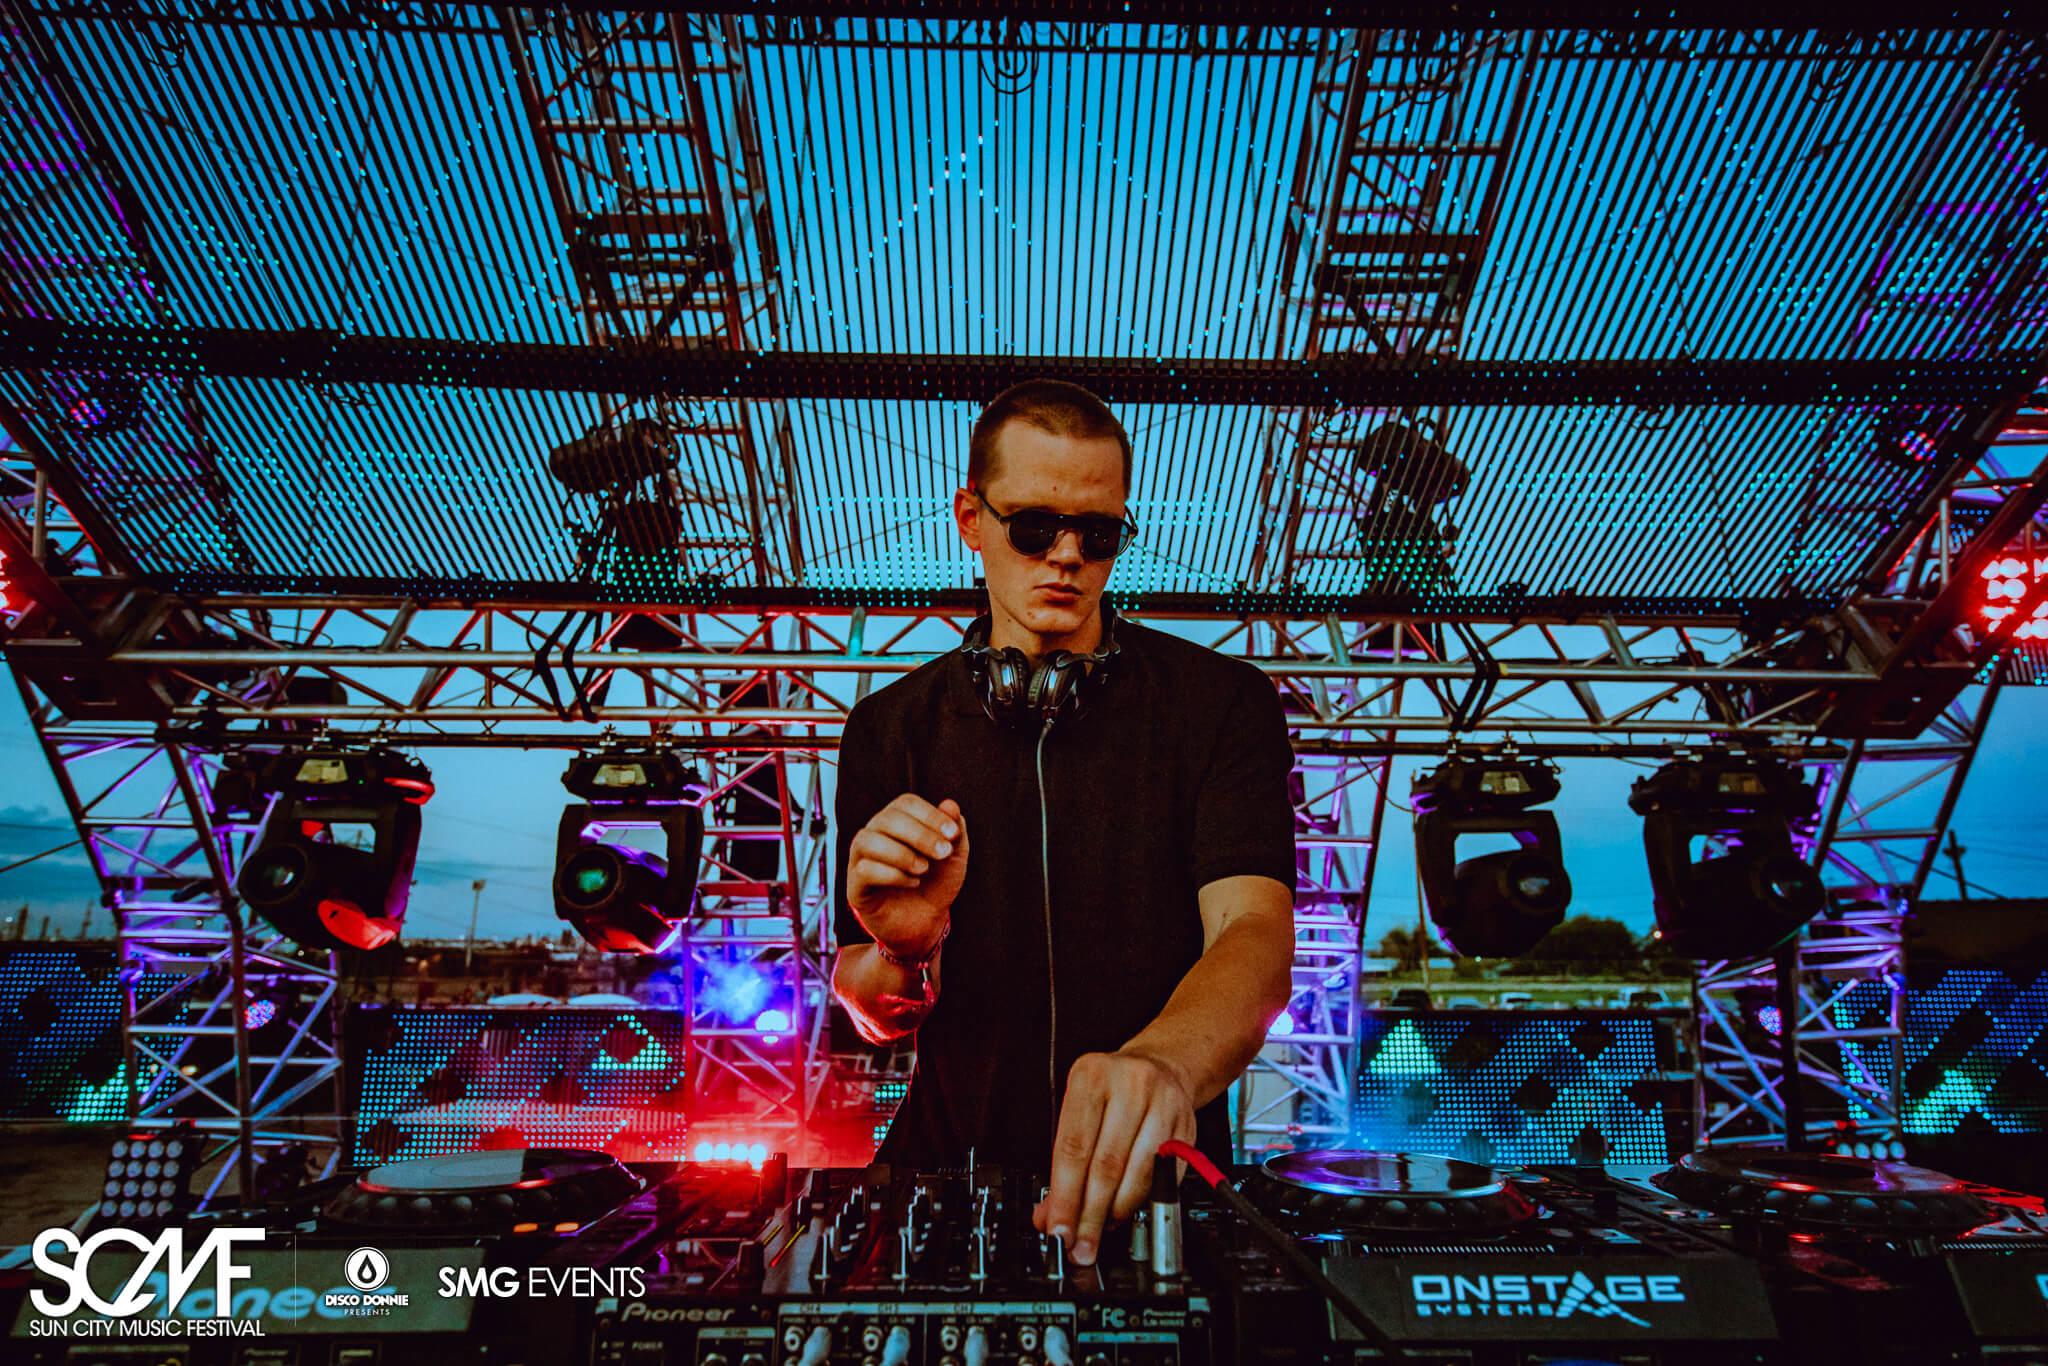 DJ live at scmf